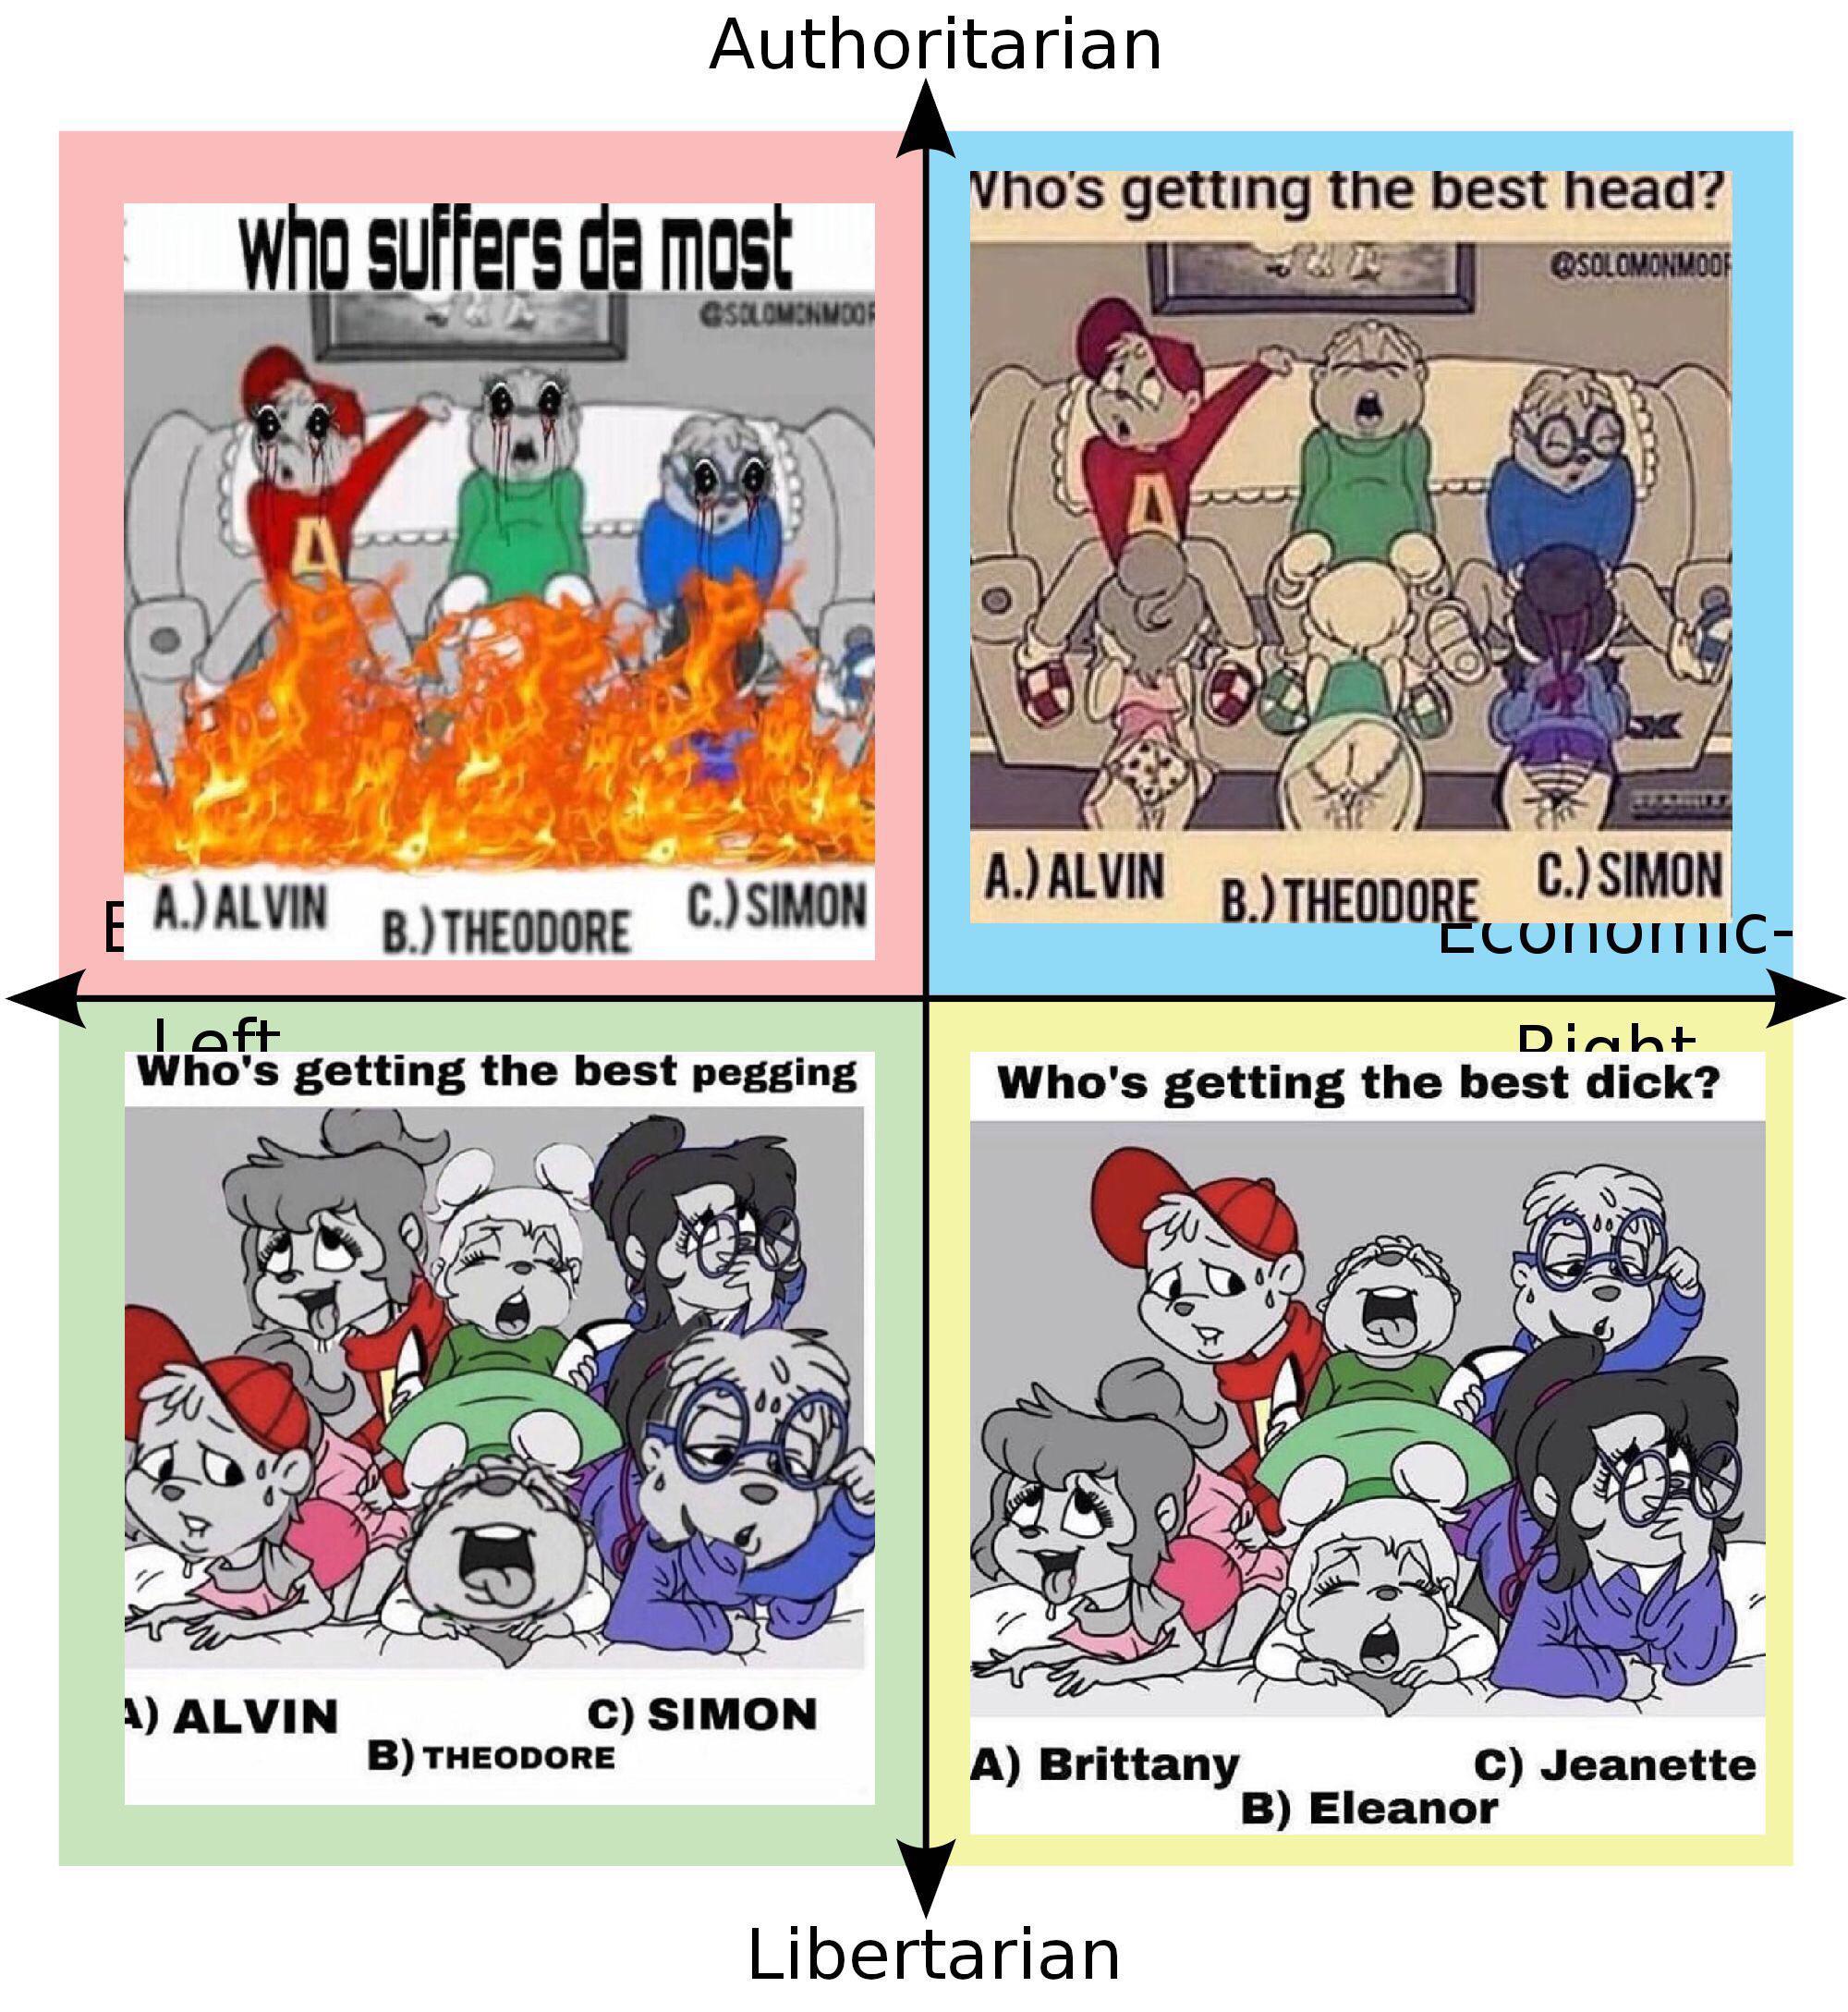 Alvin And The Chipmunks Meme Best Head - 10lilian